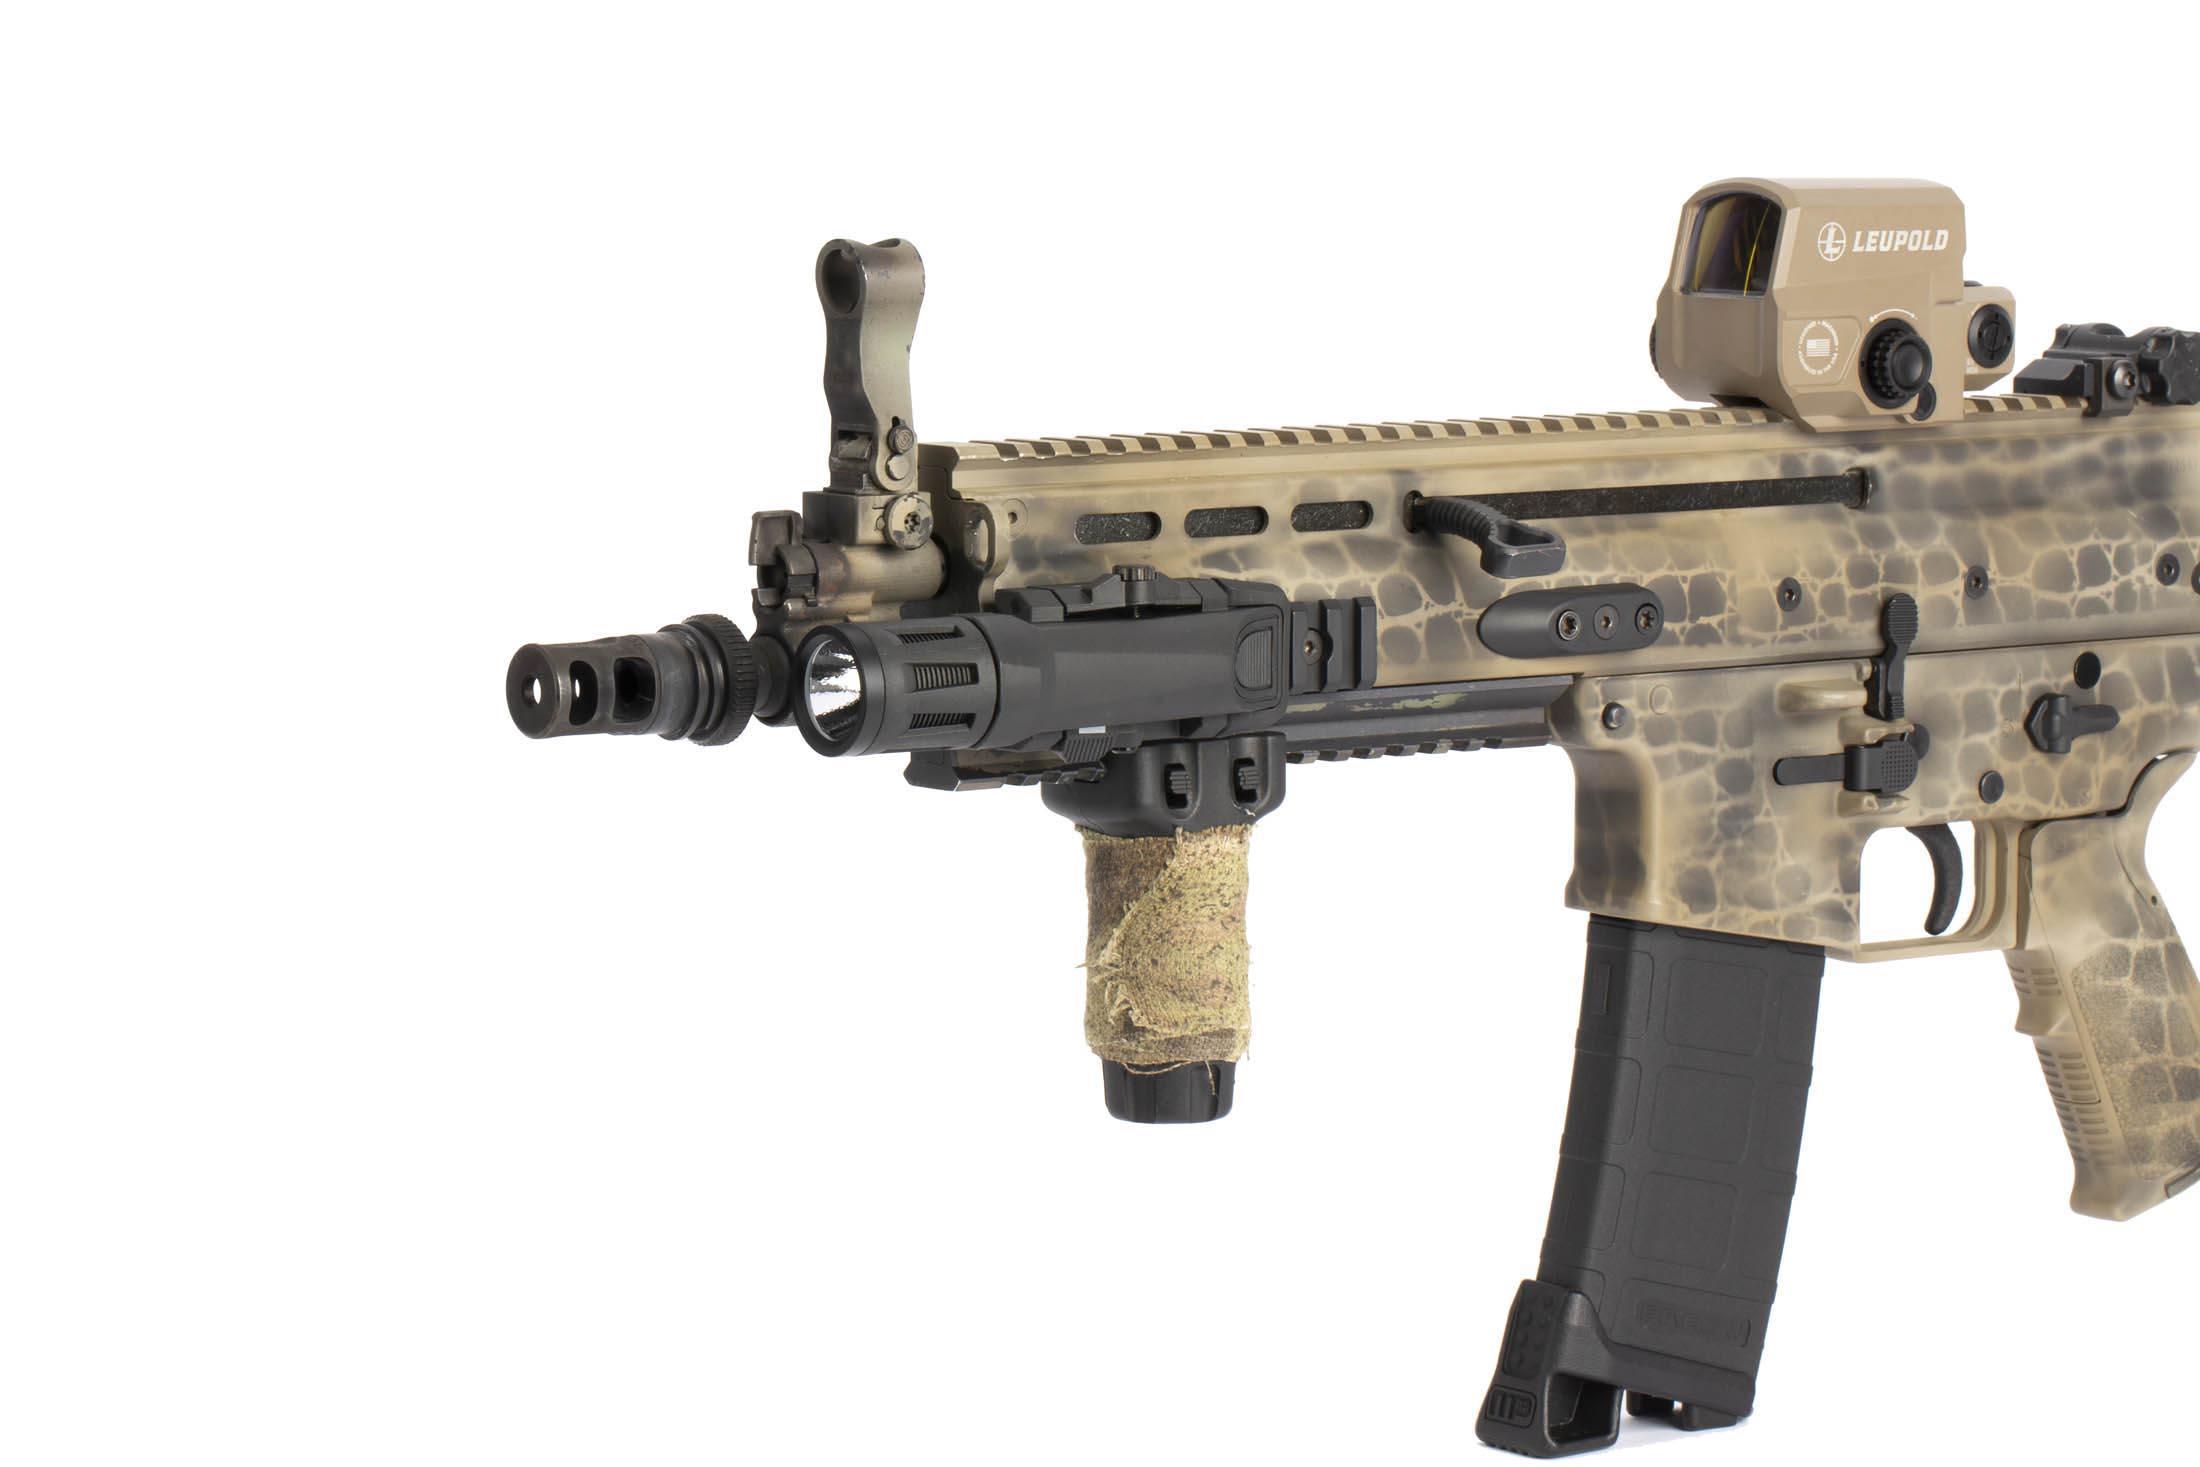 inforce wmlx gen 2 weapon mounted light 800 lumens black inf wx 05 1